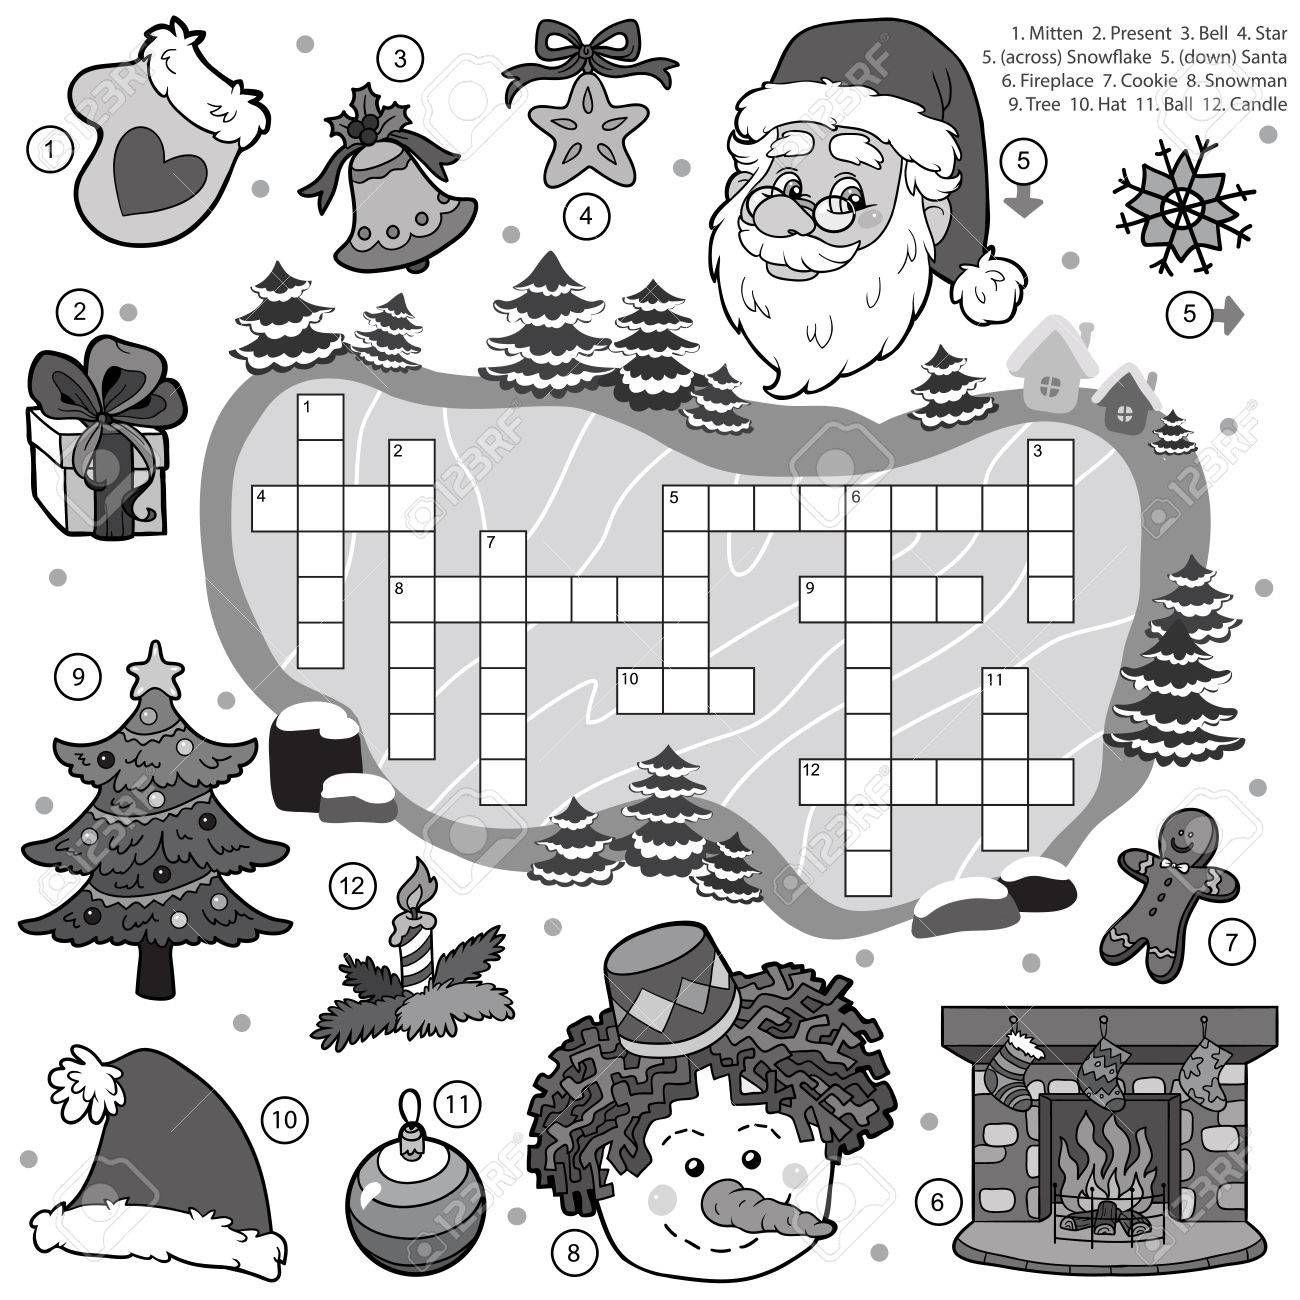 Stock Photo Games for kids, Crossword, Games